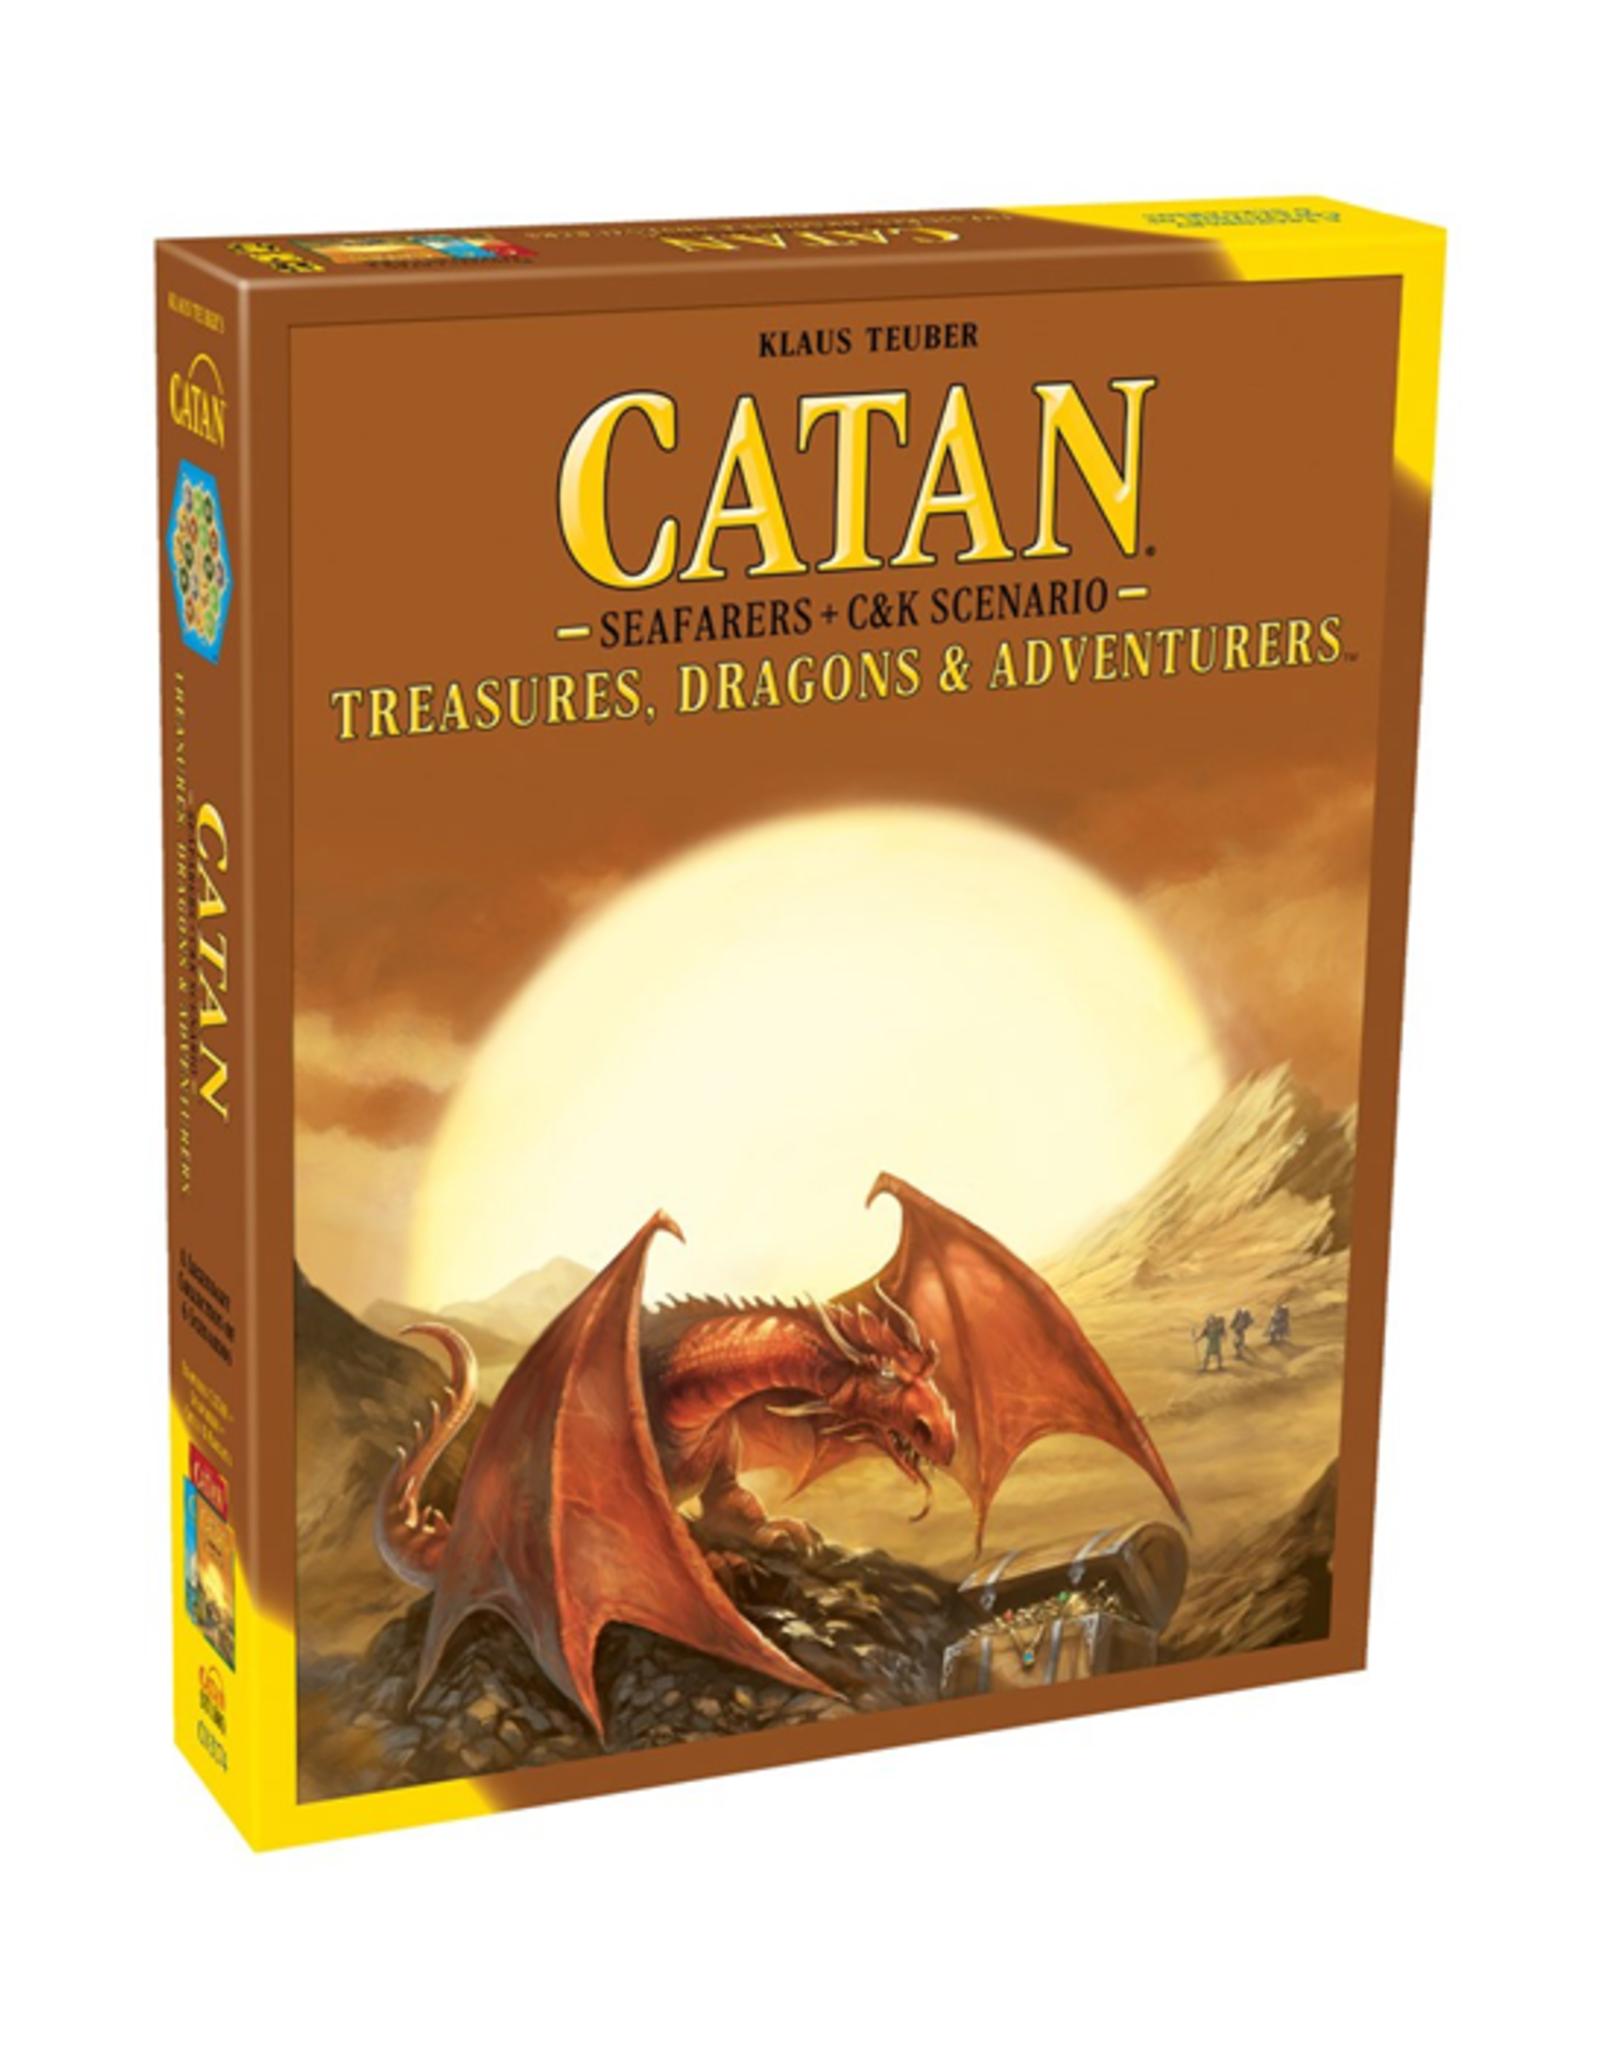 Catan: Treasures, Dragons, & Adventurers